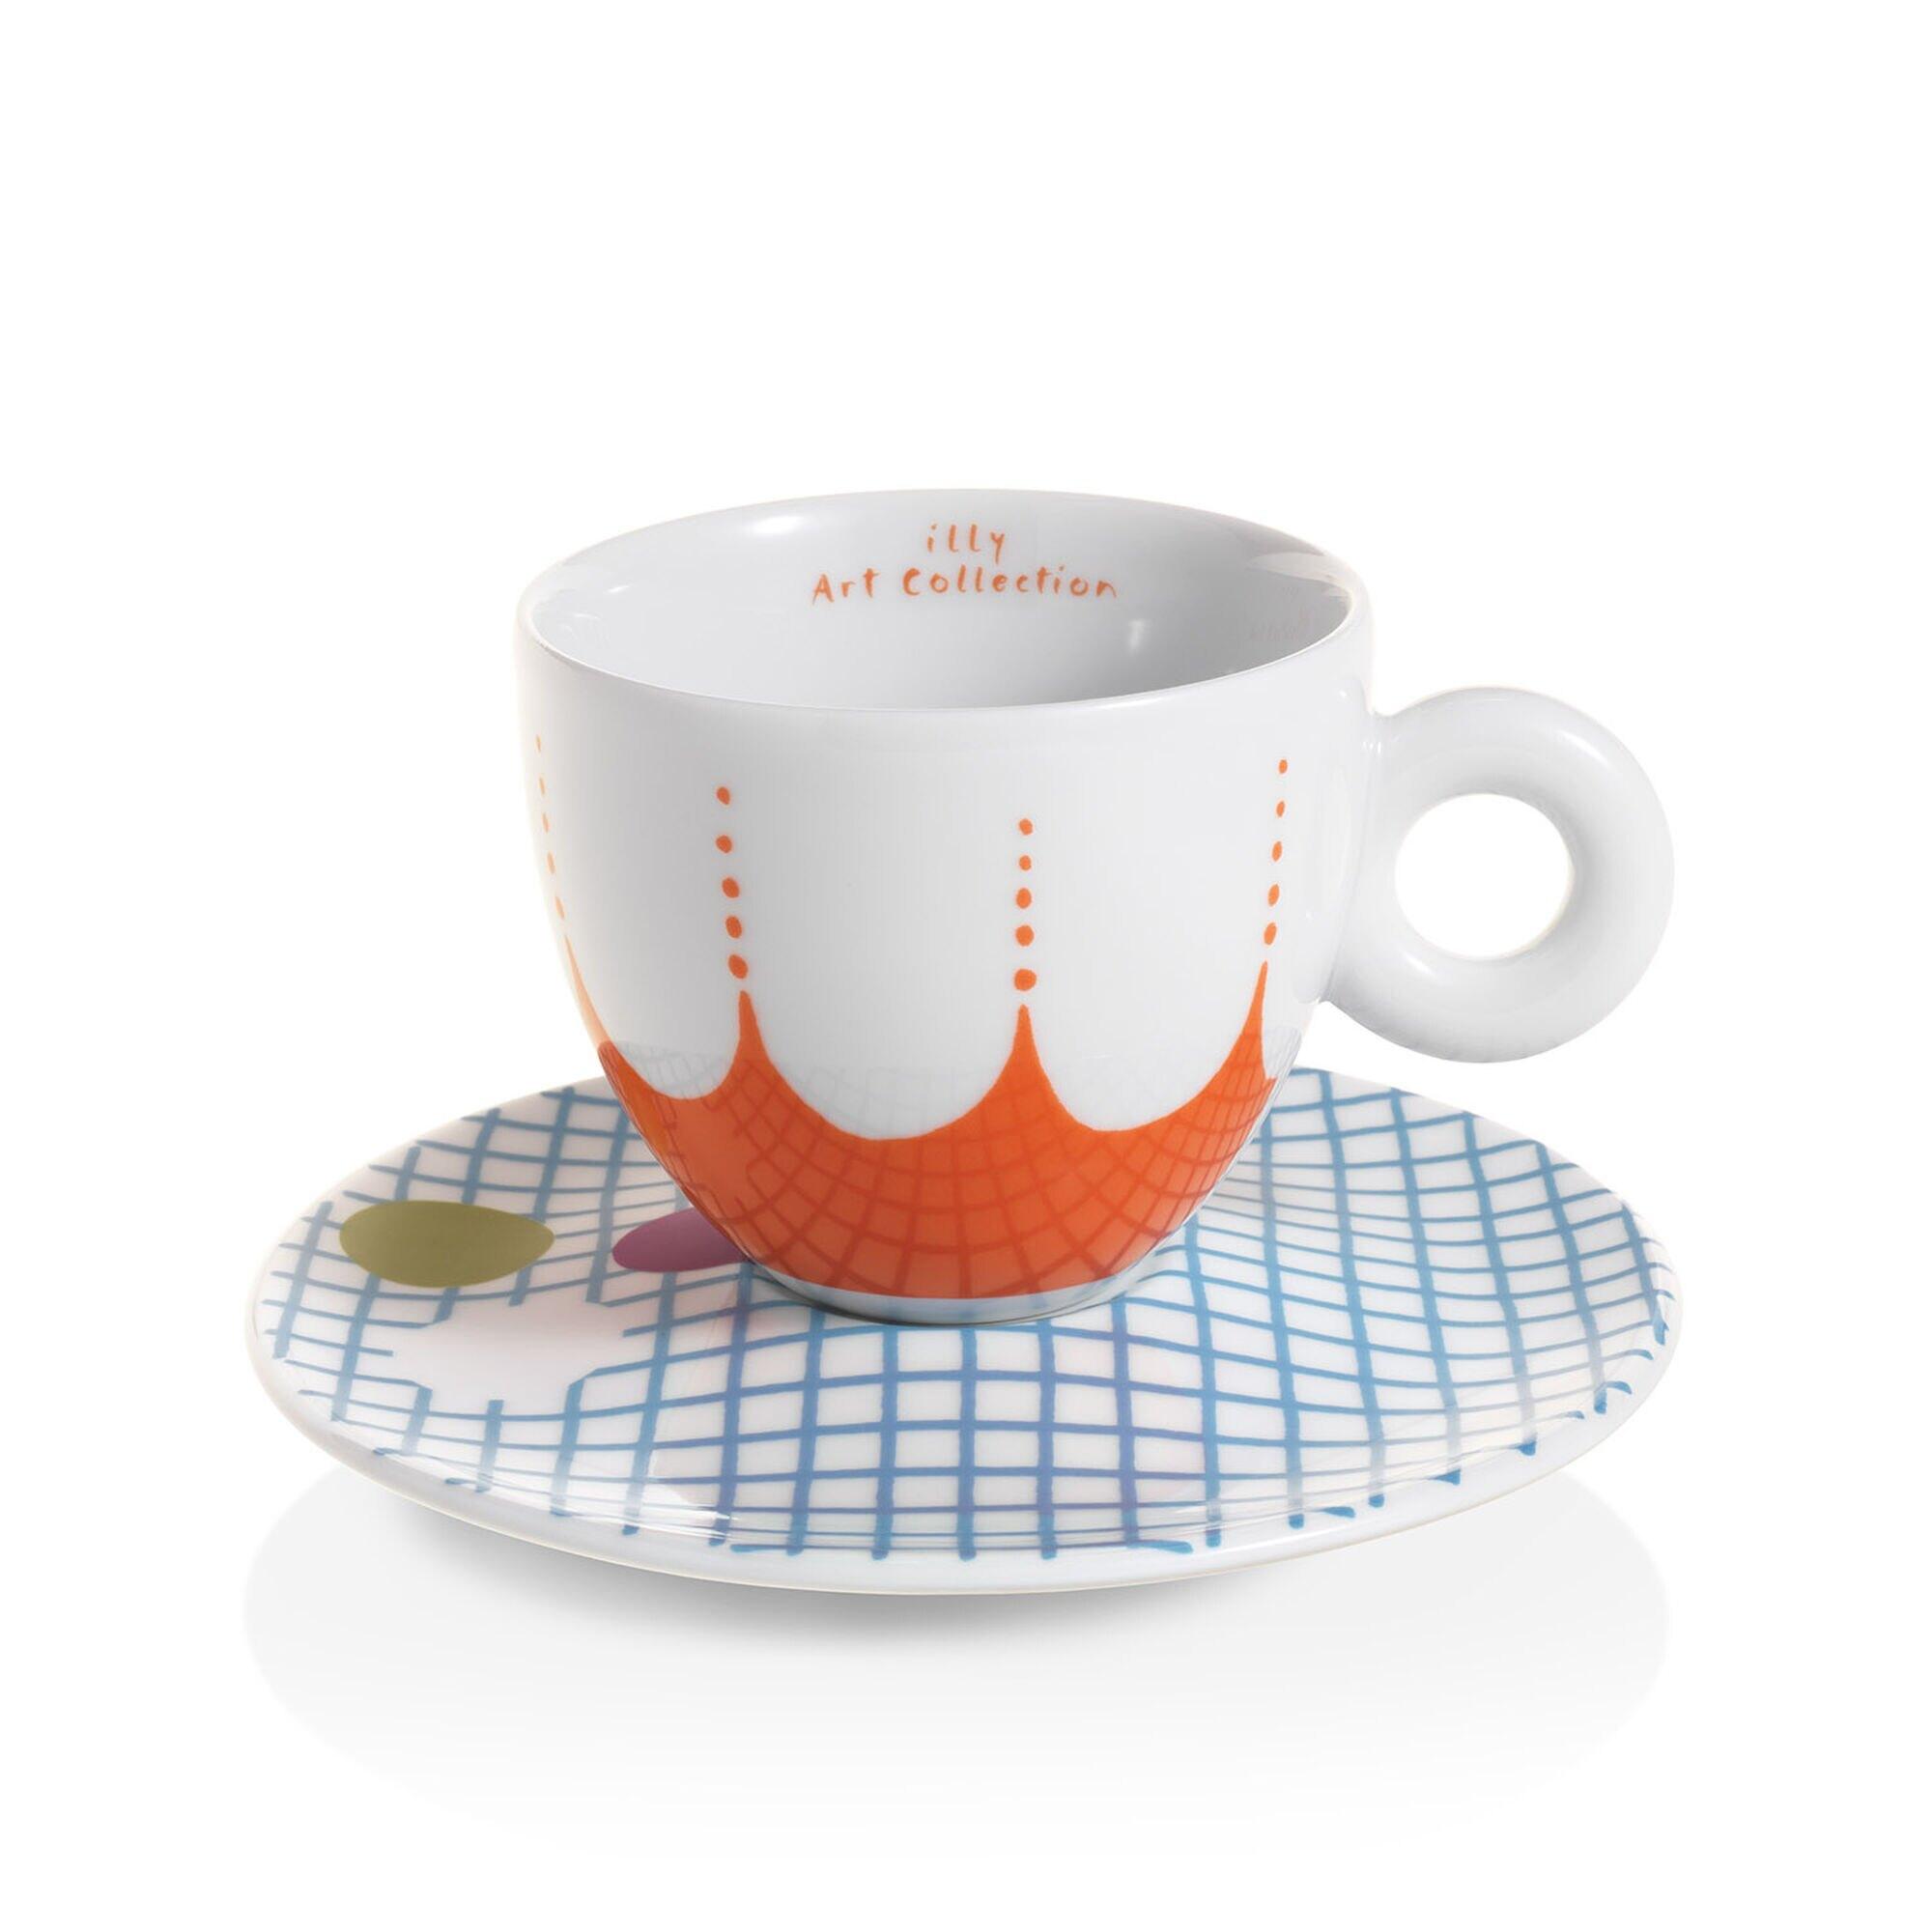 Caffe Milano illy Caffe Kaffee Becher Mug Tasse 300ml